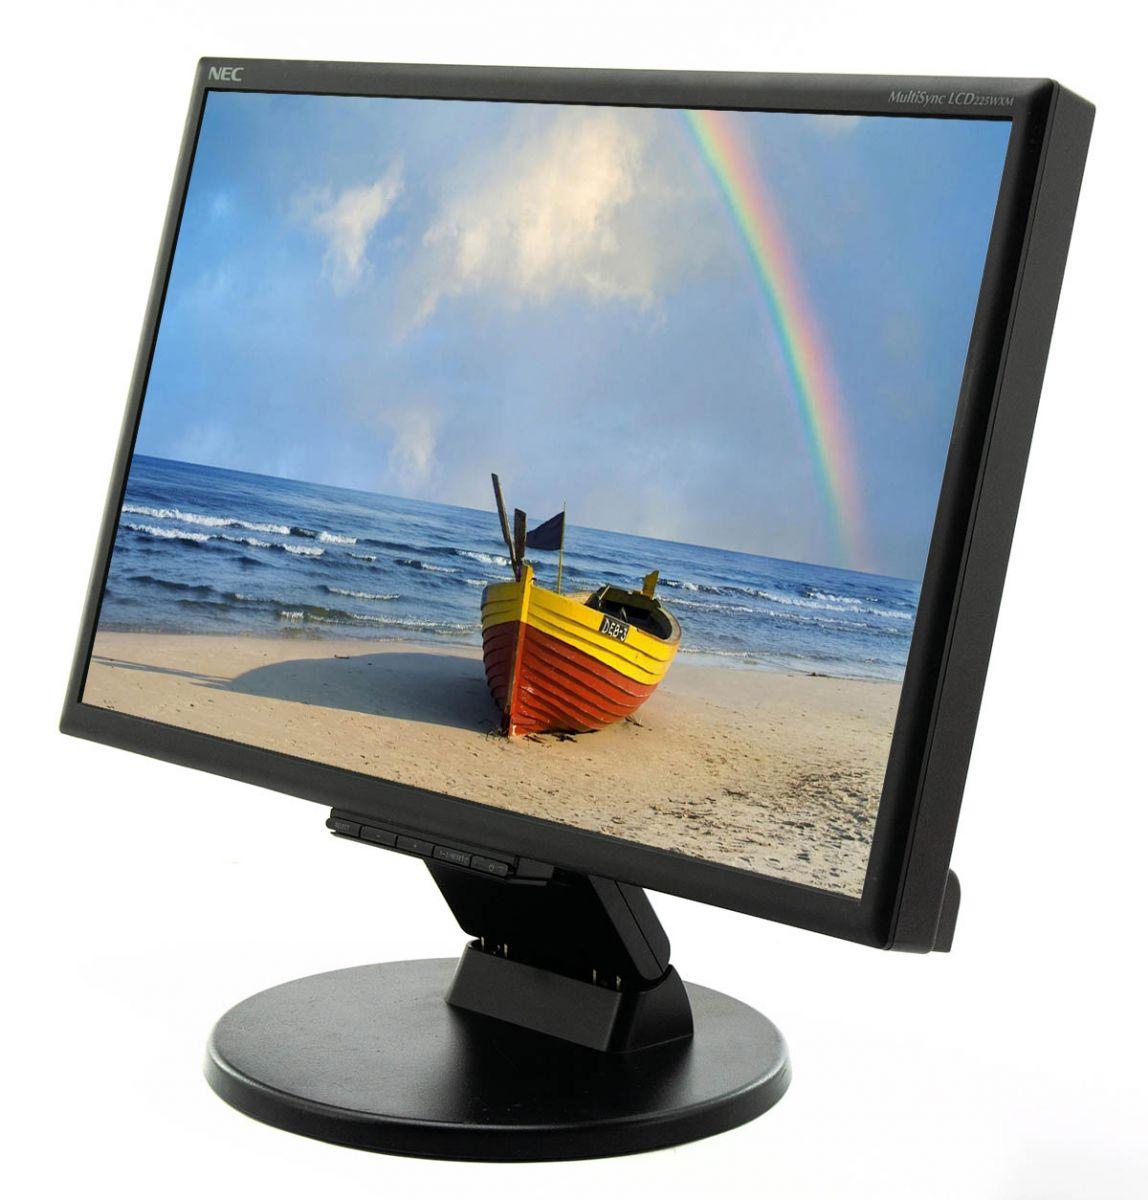 NEC MULTISYNC LCD225WXM WINDOWS 10 DRIVERS